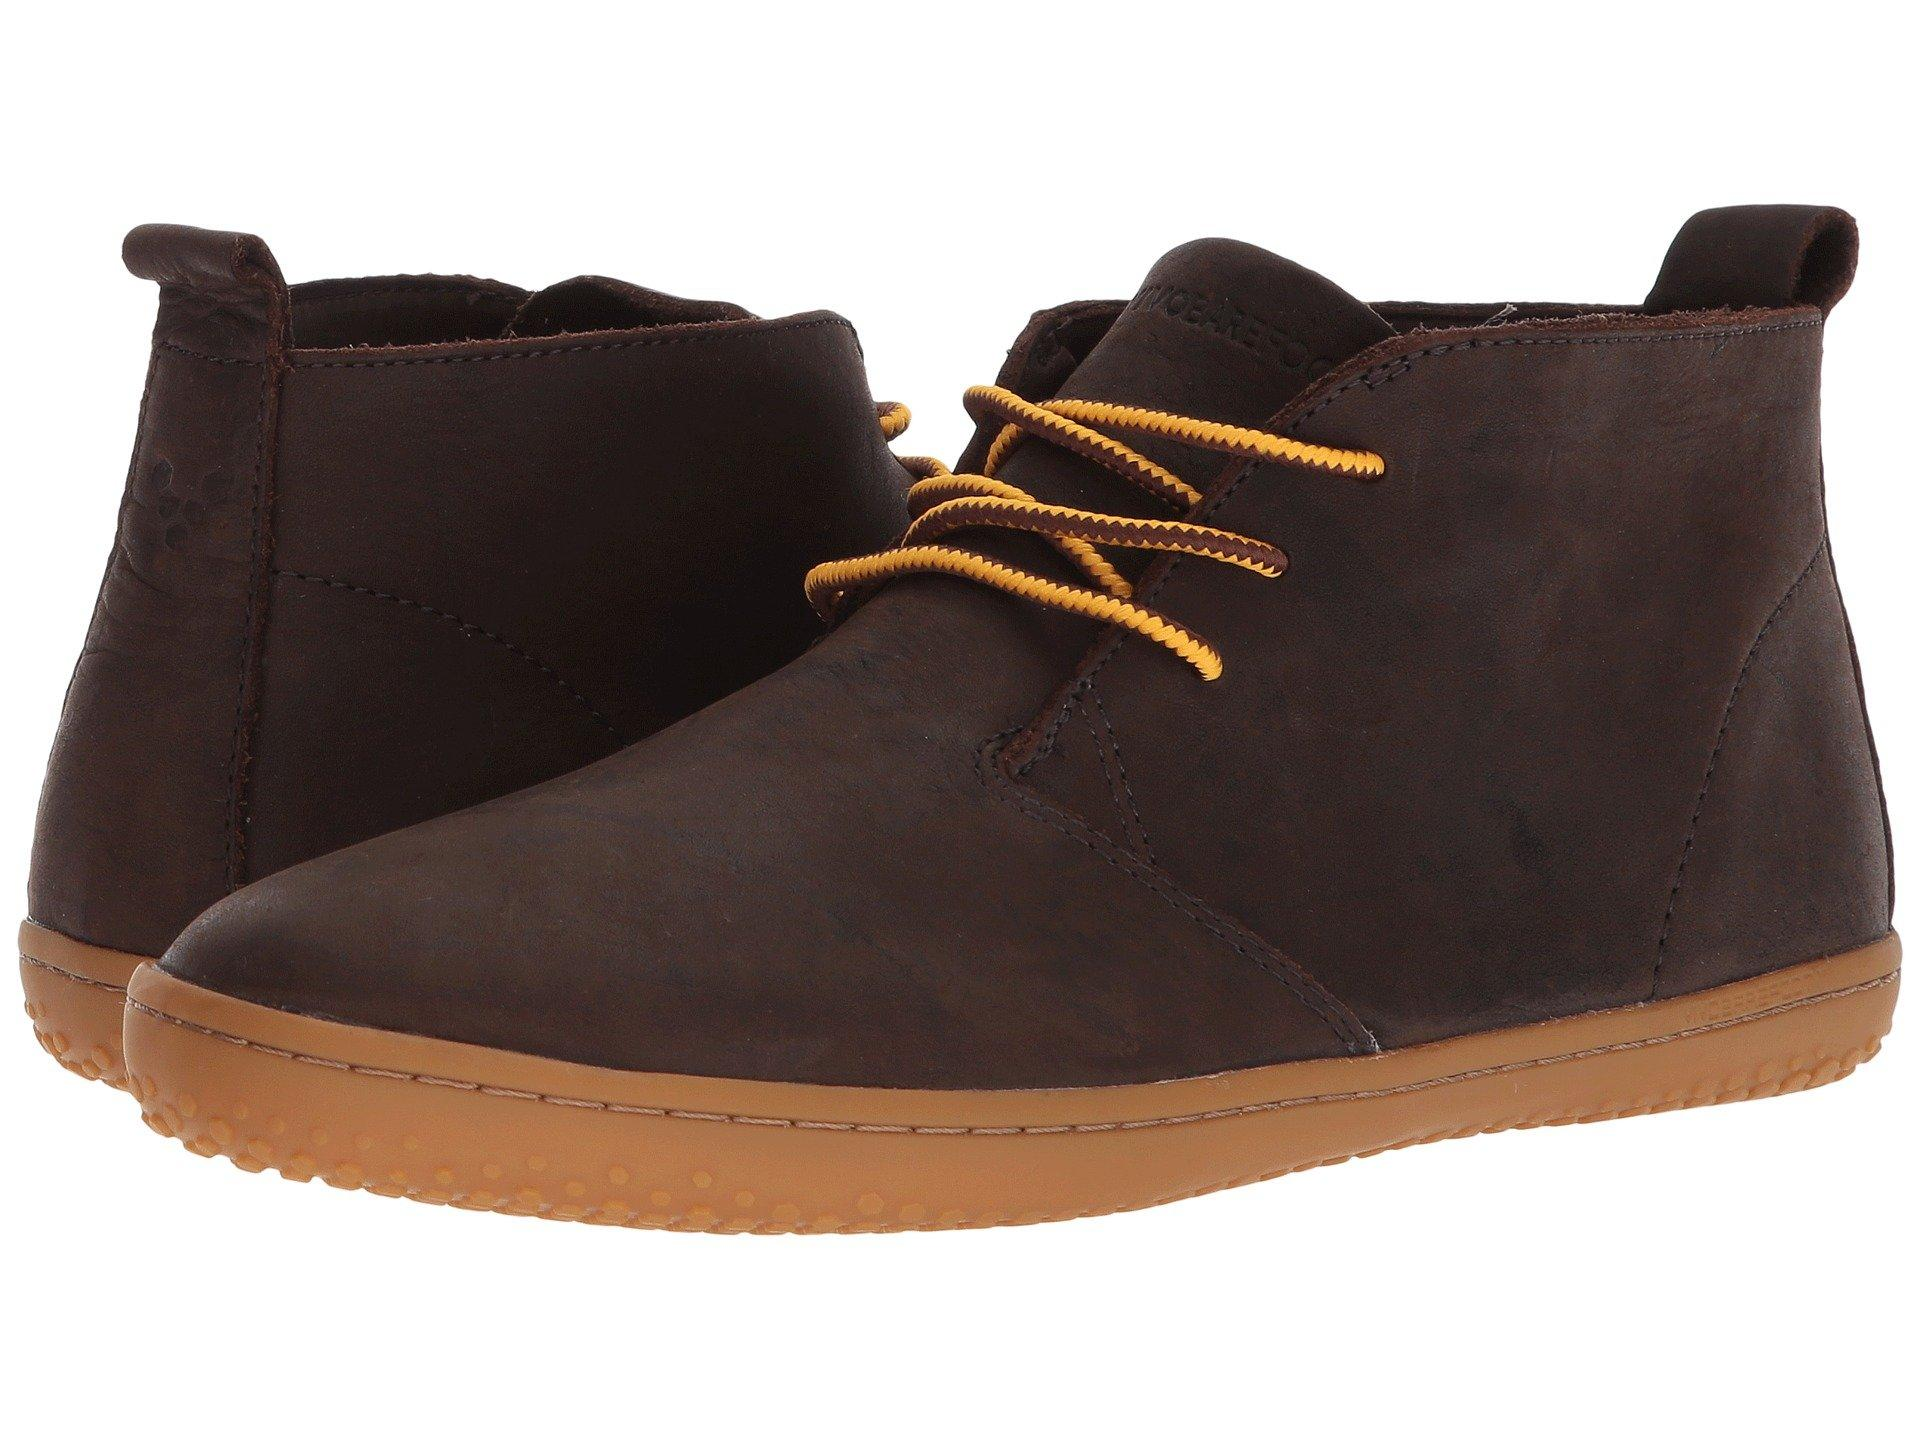 Vivobarefoot Gobi Ii Leather in Brown - Lyst